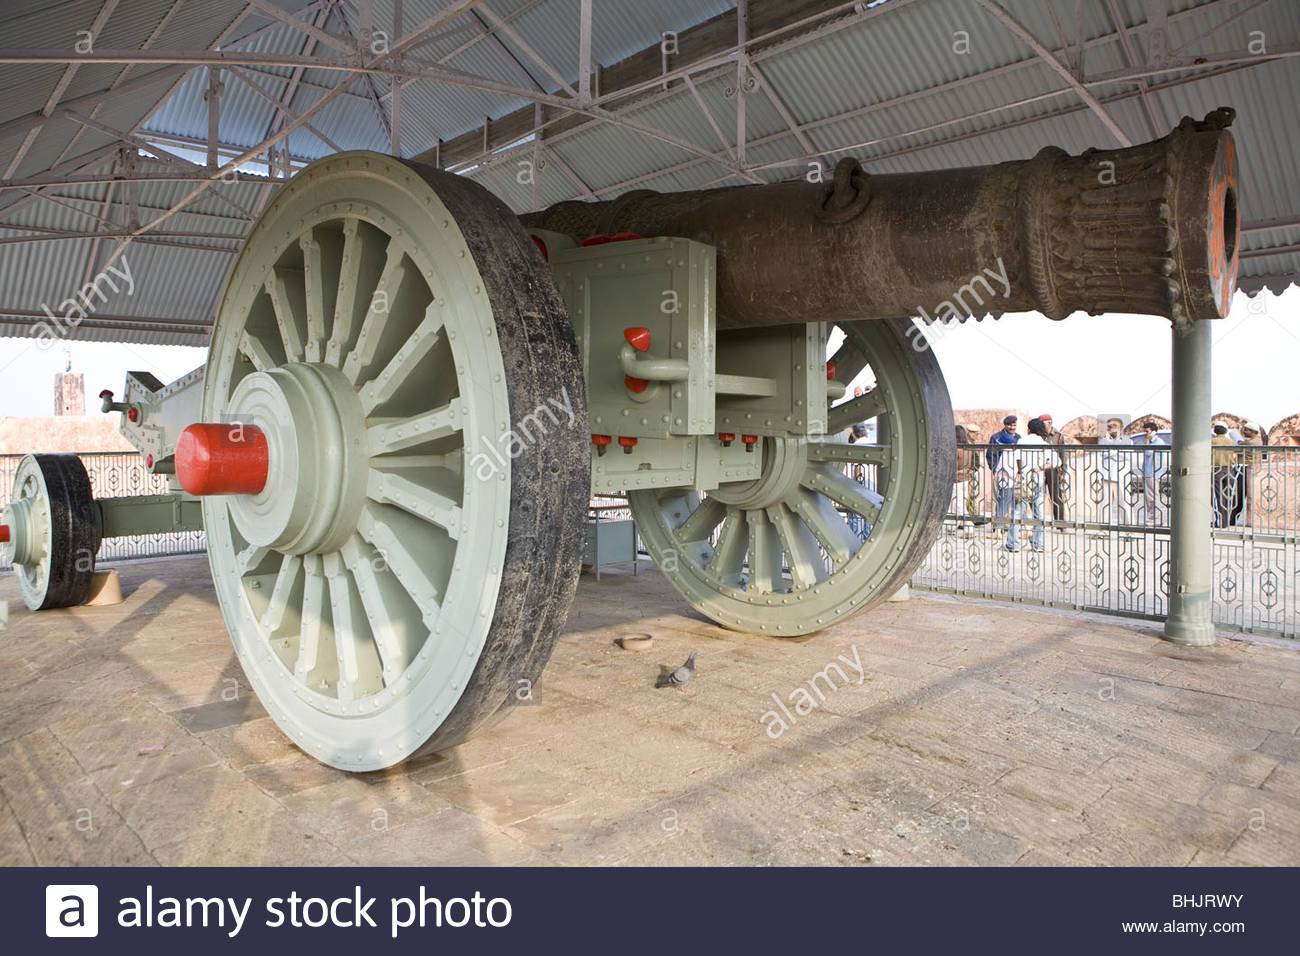 Jaigarh Fort Jaipur, Rajasthan, India Jaivana Cannon - Stock Image